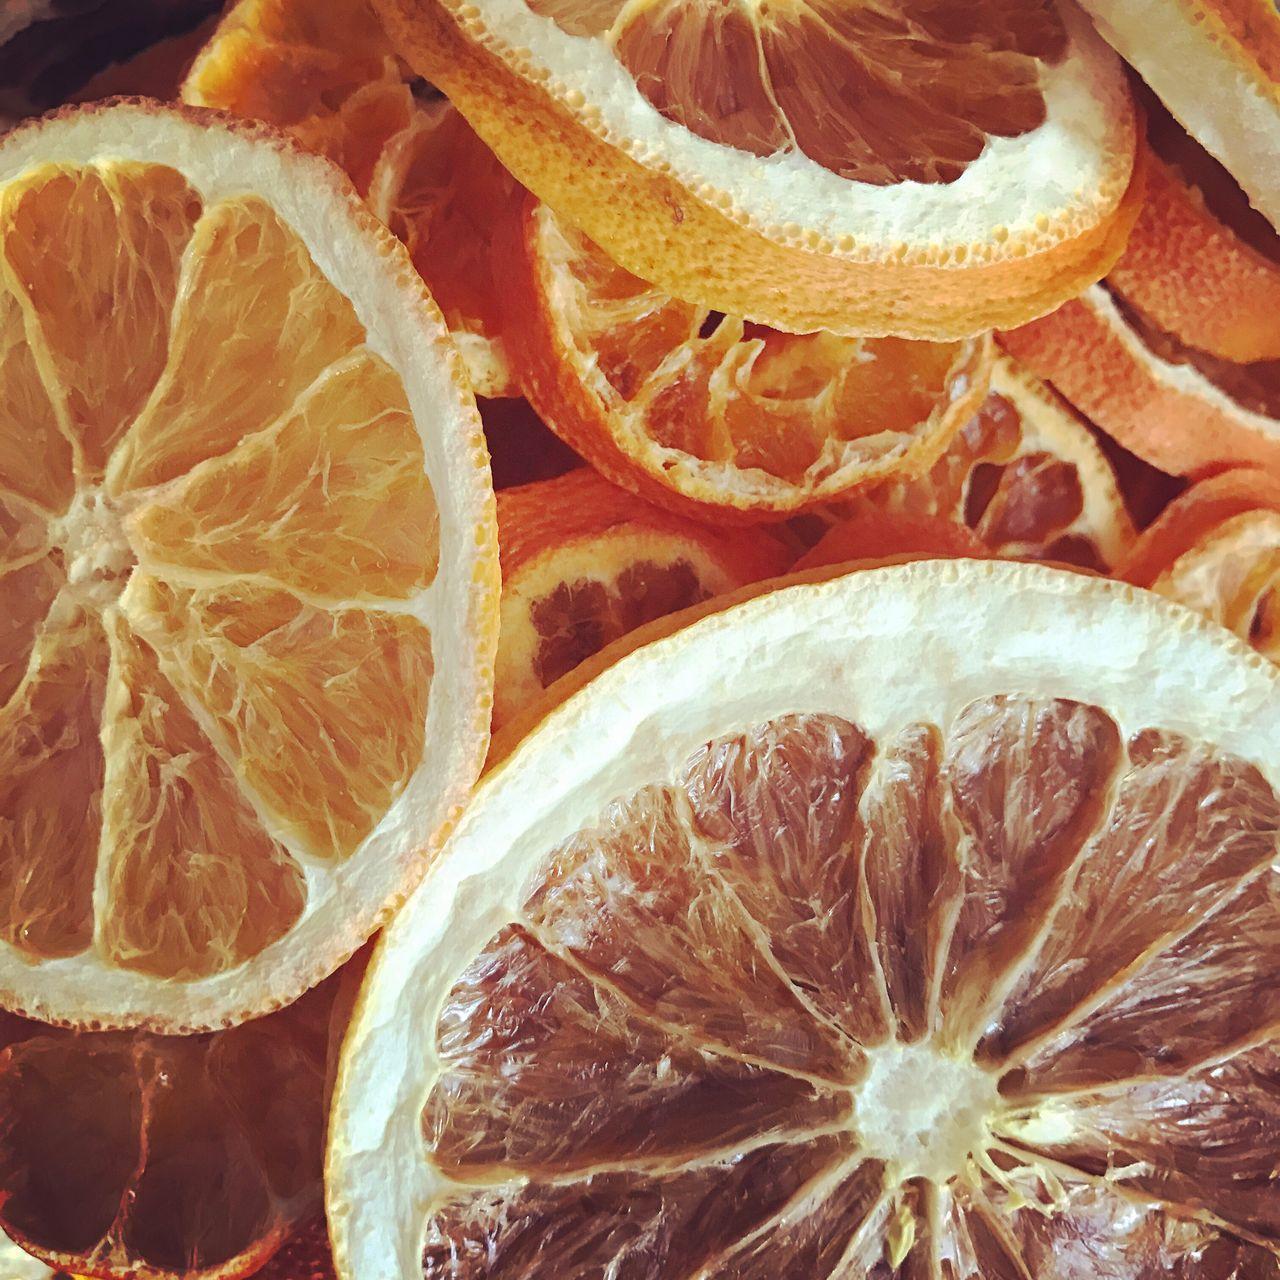 Cross Section Citrus Fruit Healthy Eating SLICE Fruit Food And Drink Food Freshness Full Frame Grapefruit No People Indoors  Blood Orange Close-up